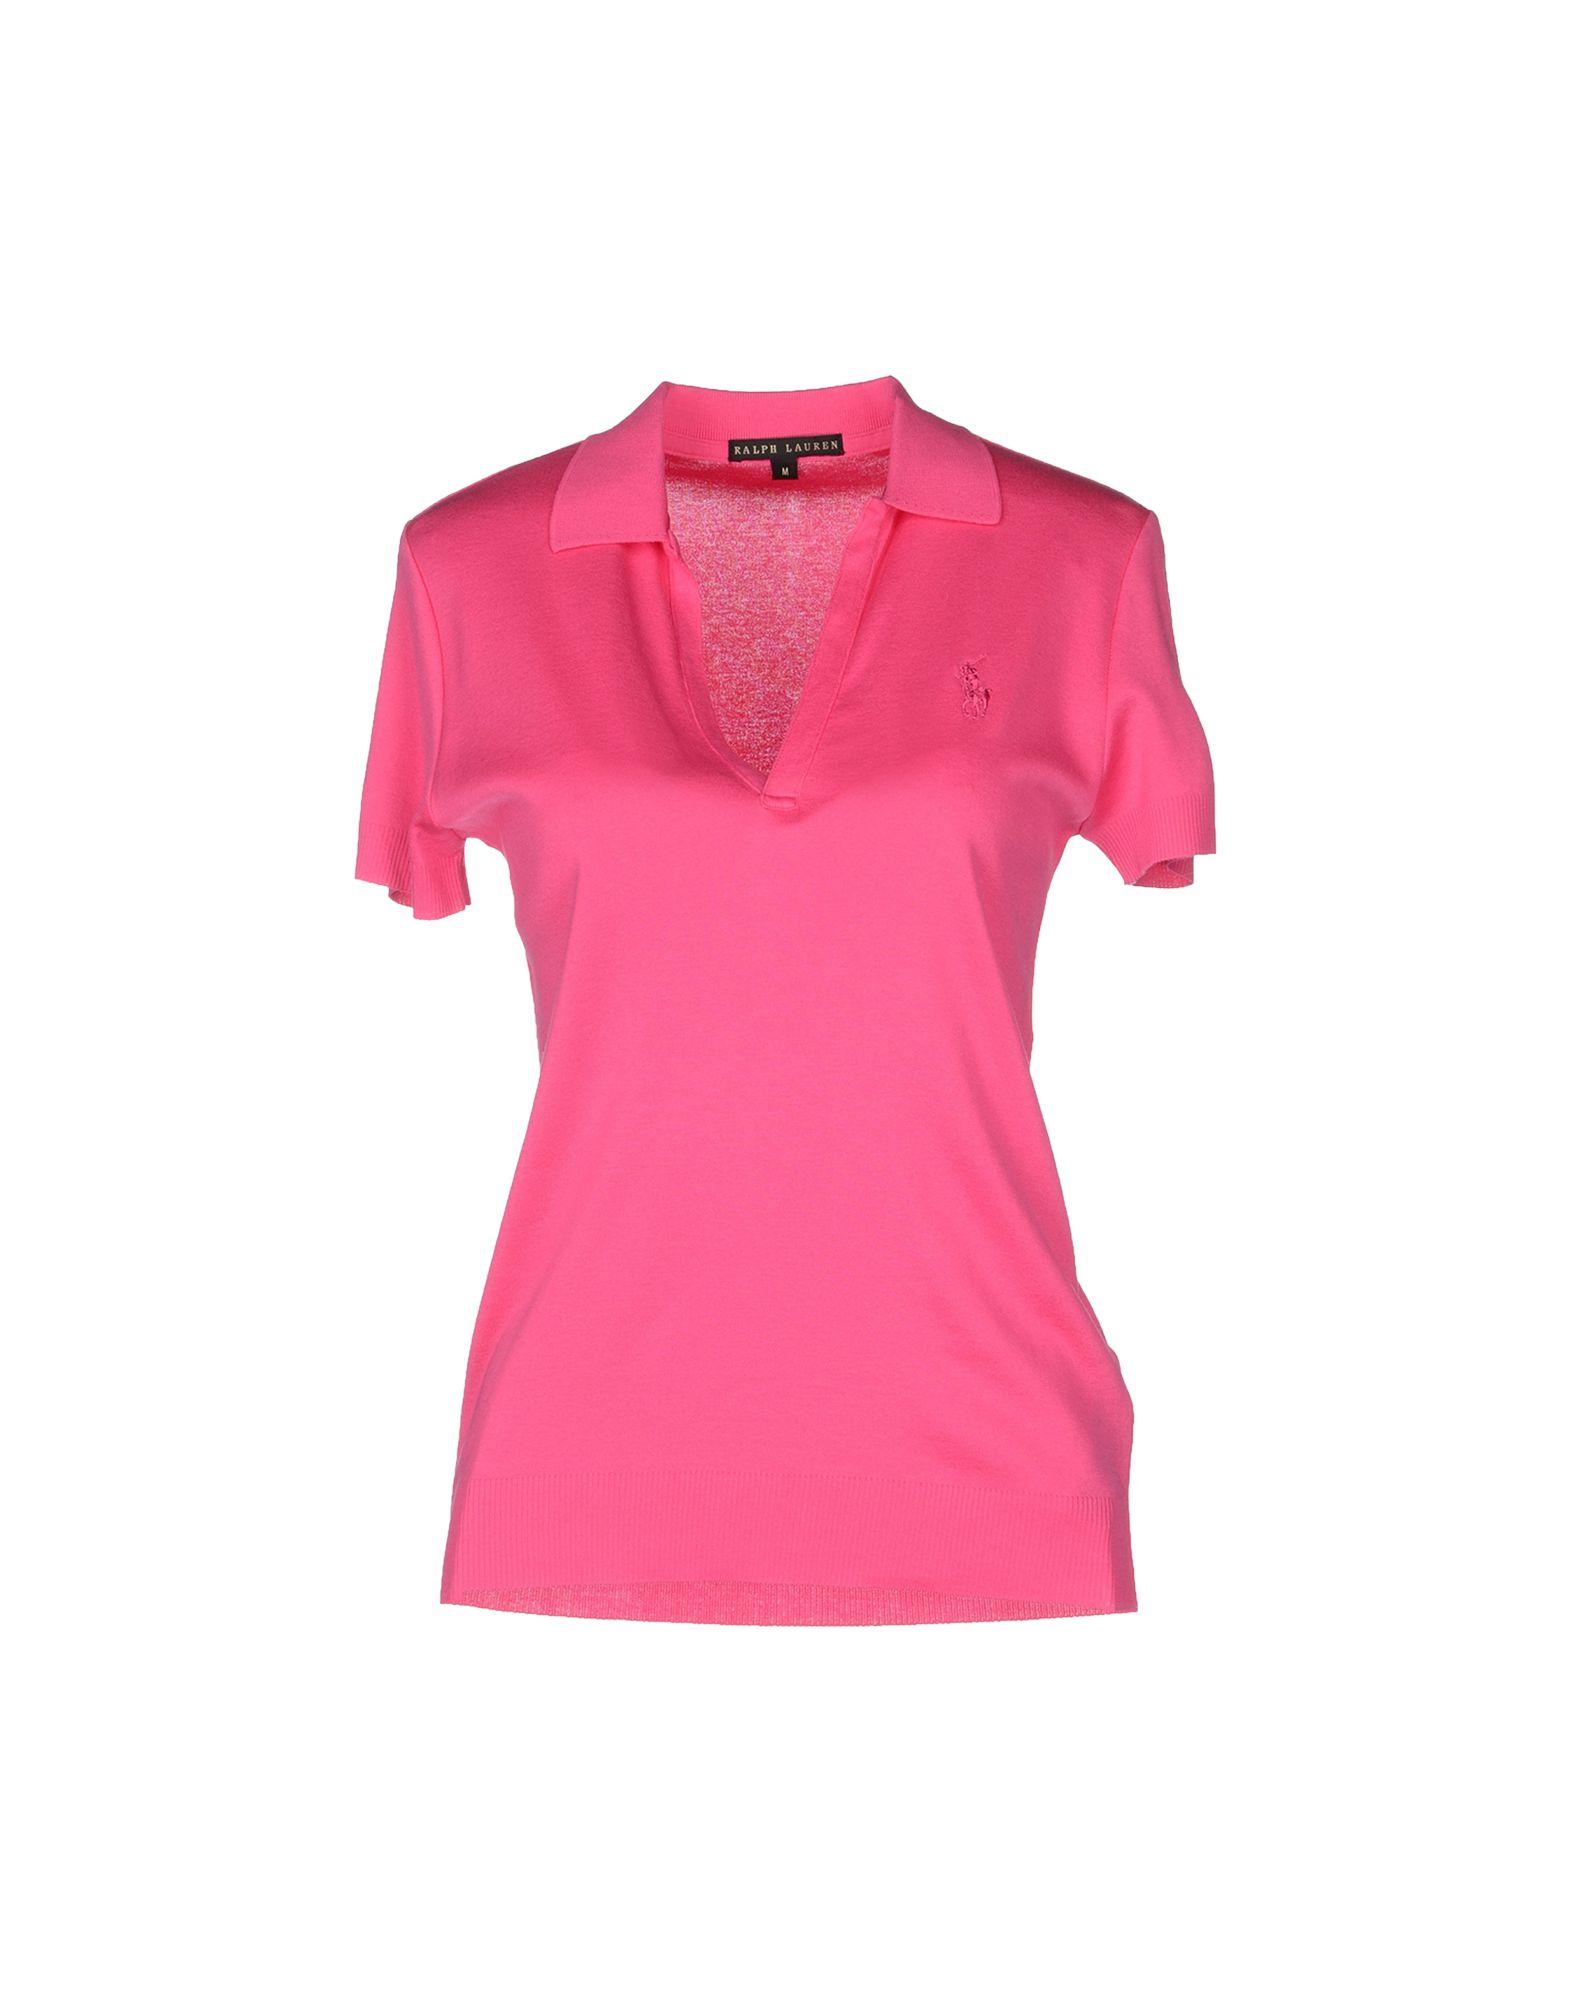 Ralph lauren black label polo shirt in pink fuchsia lyst for Ralph lauren black label polo shirt